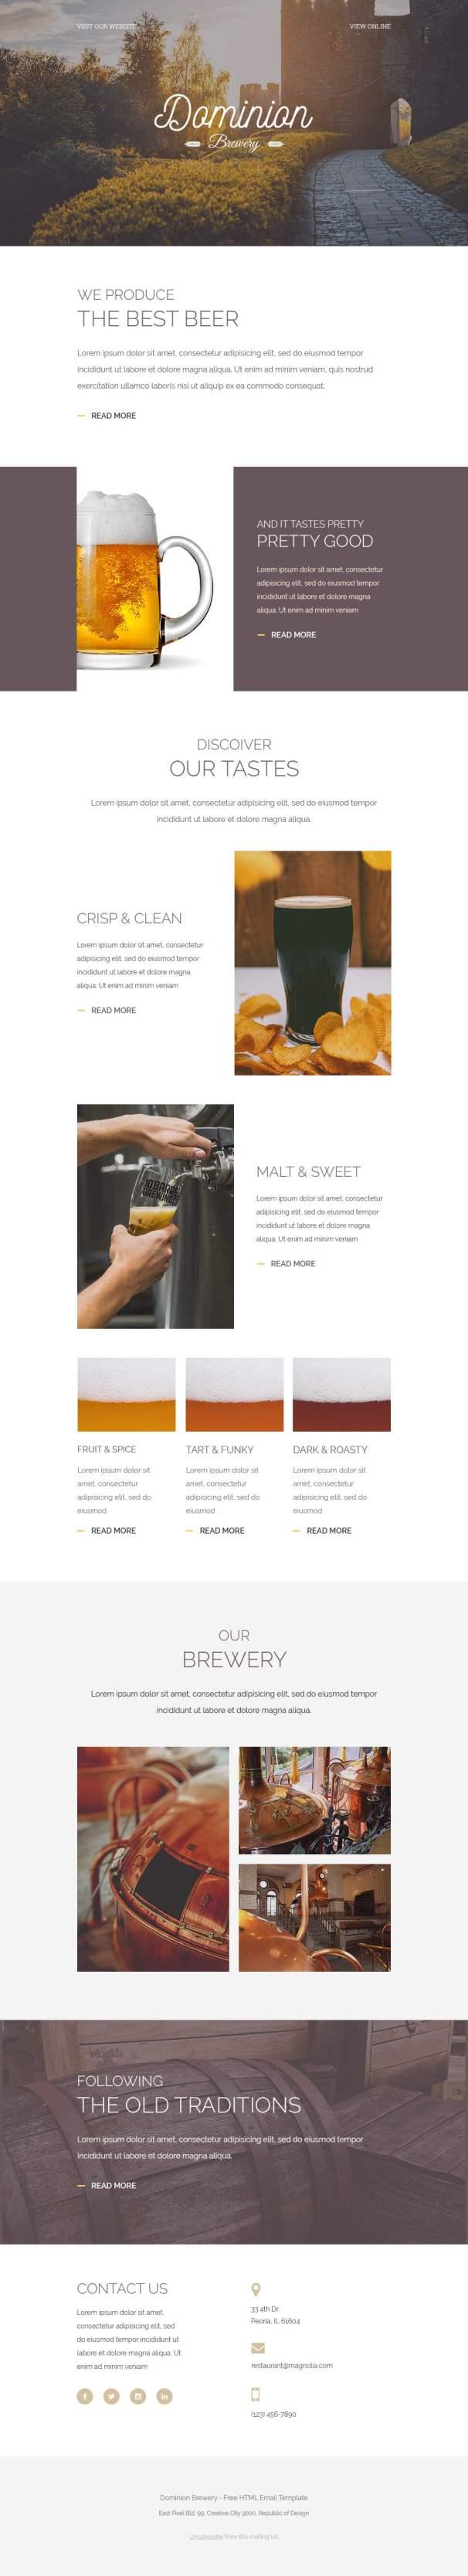 MB_Freemium-Templates_Food-and-Restaurants_5